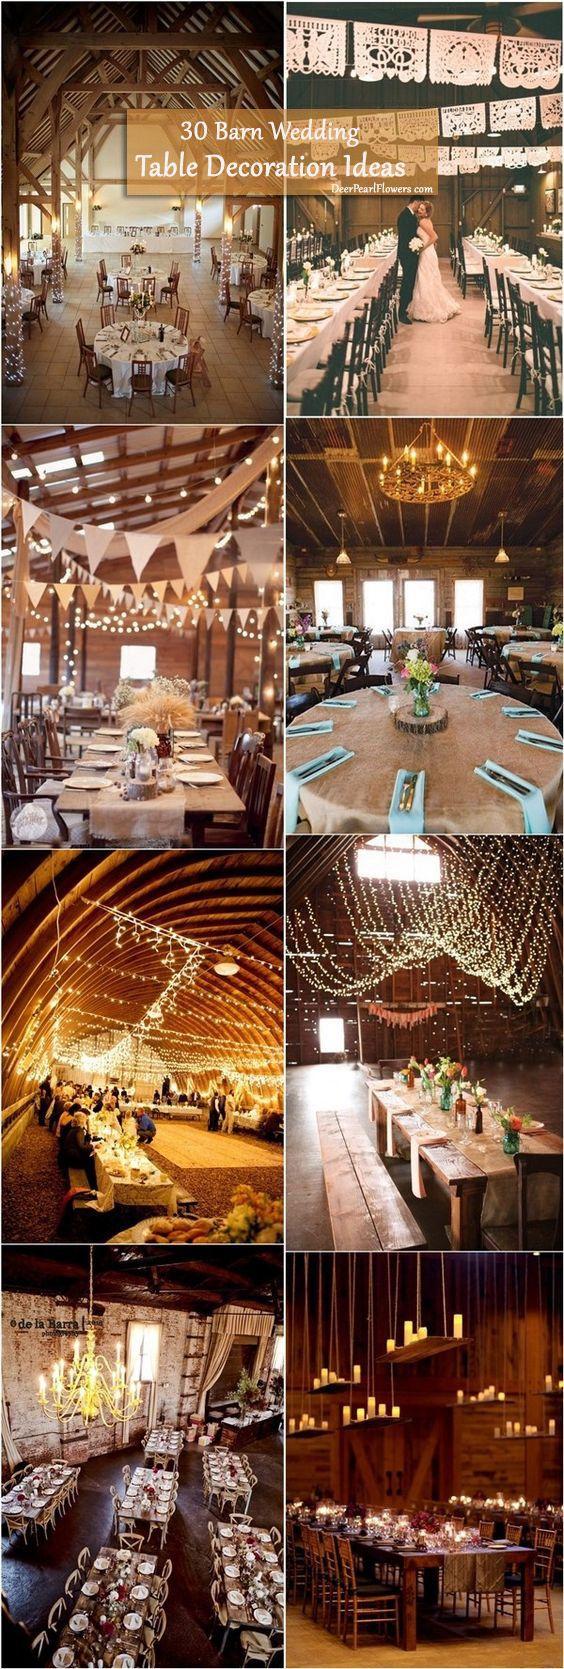 Best 25 Reception Table Decorations Ideas On Pinterest